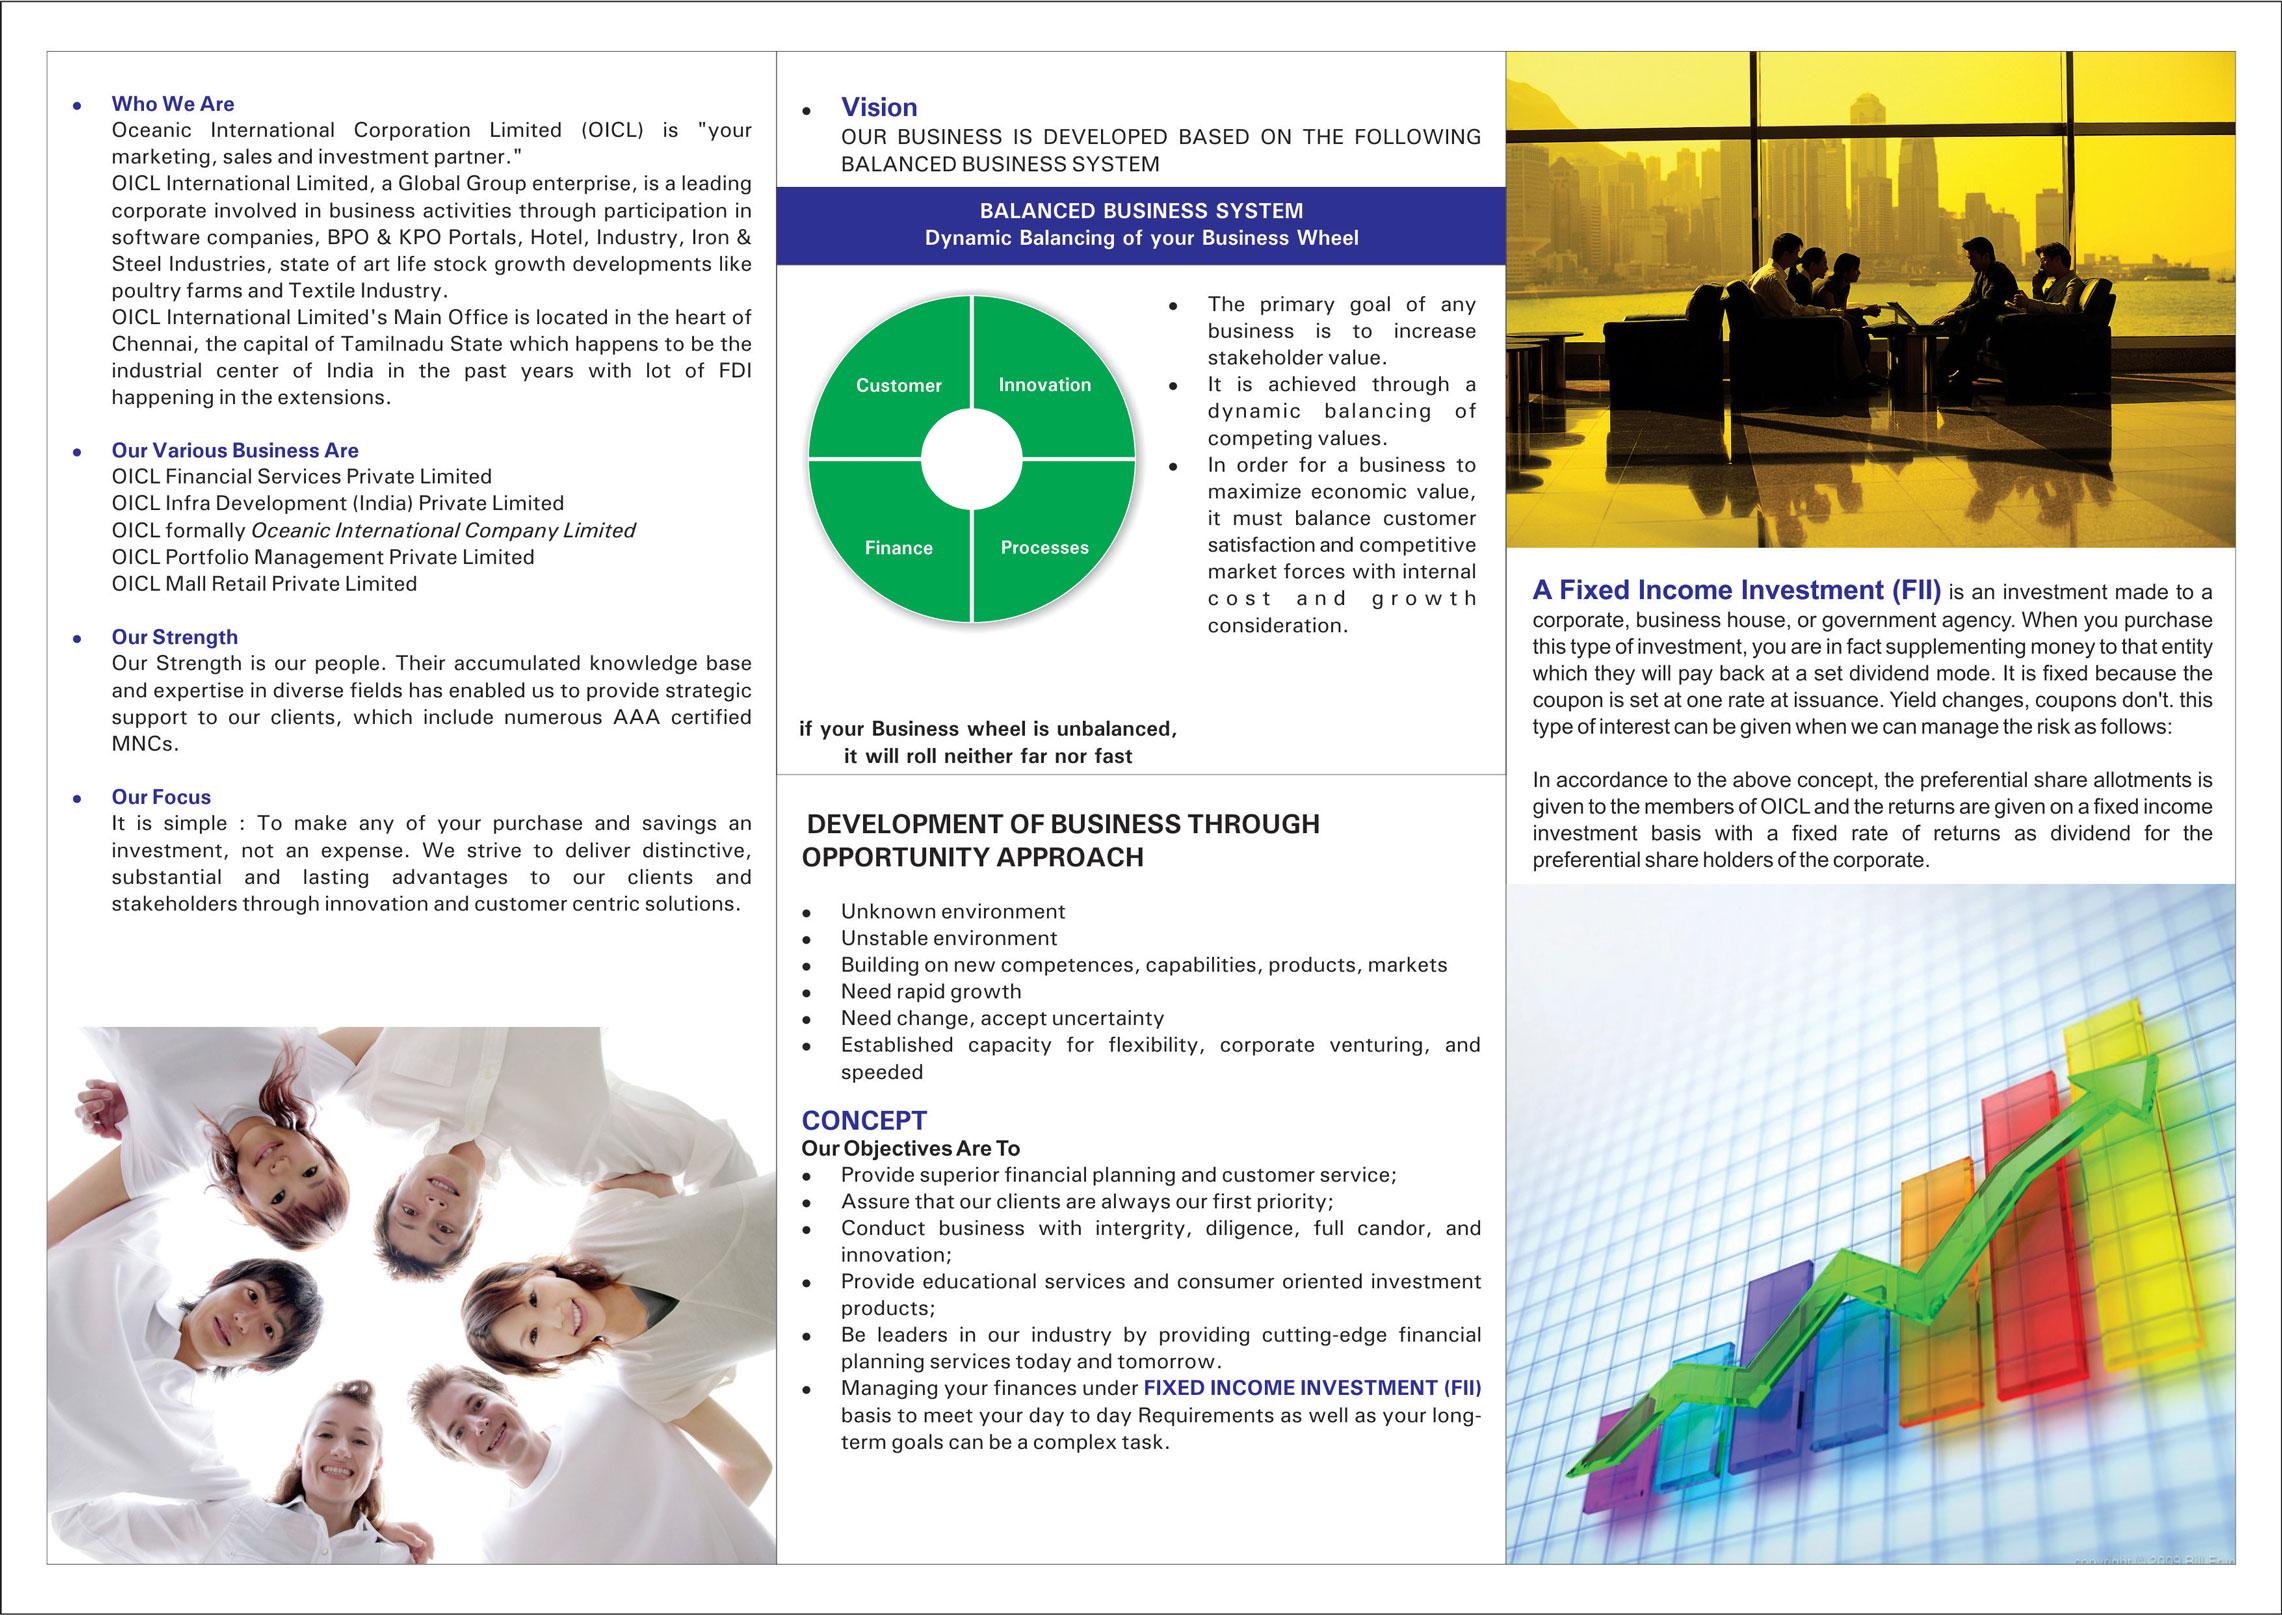 brochure-oceanic-international-corporation-oicl-business-graphic-design-back